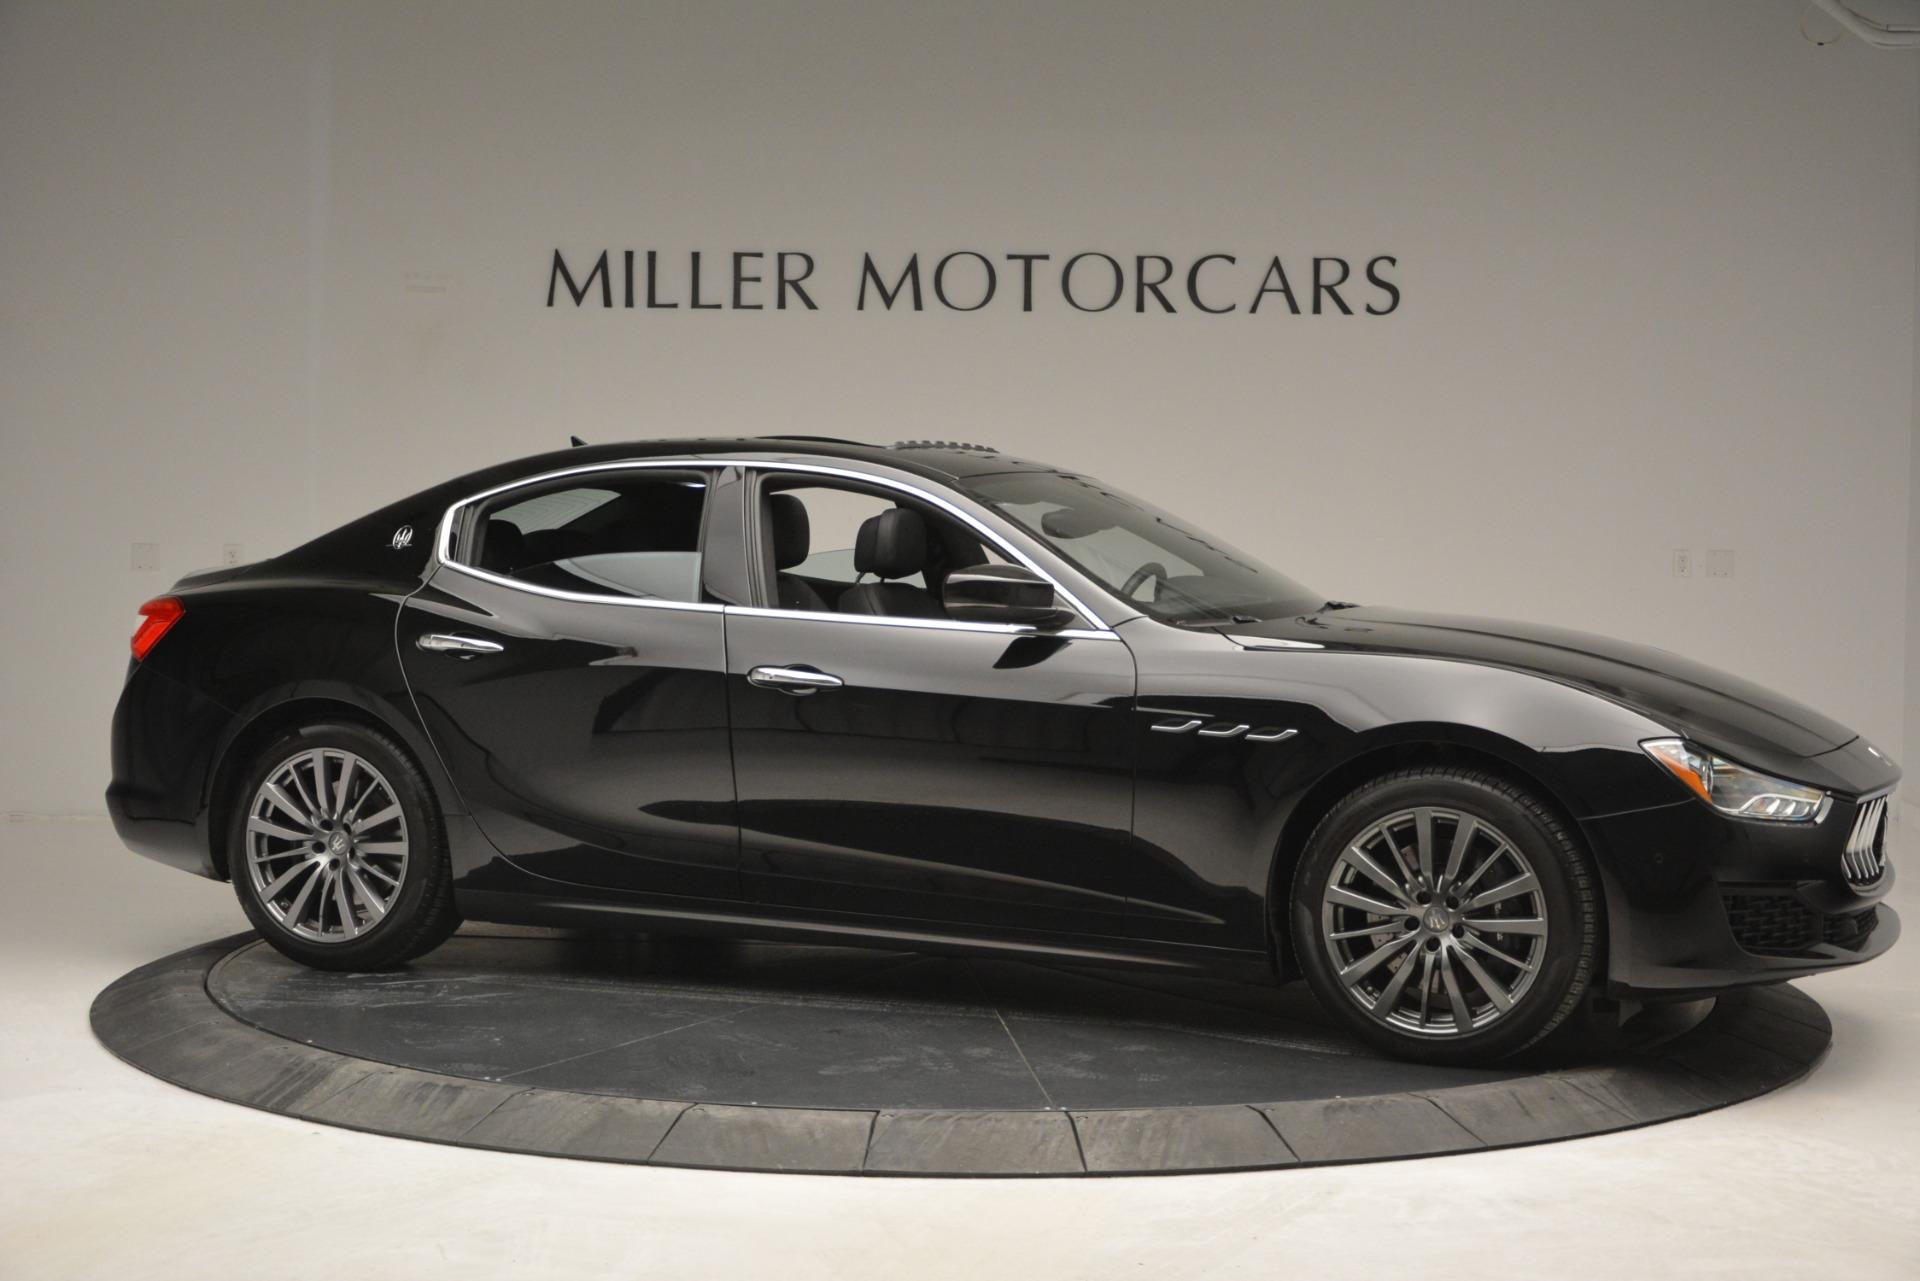 Used 2018 Maserati Ghibli S Q4 For Sale In Greenwich, CT. Alfa Romeo of Greenwich, 7481 2944_p13